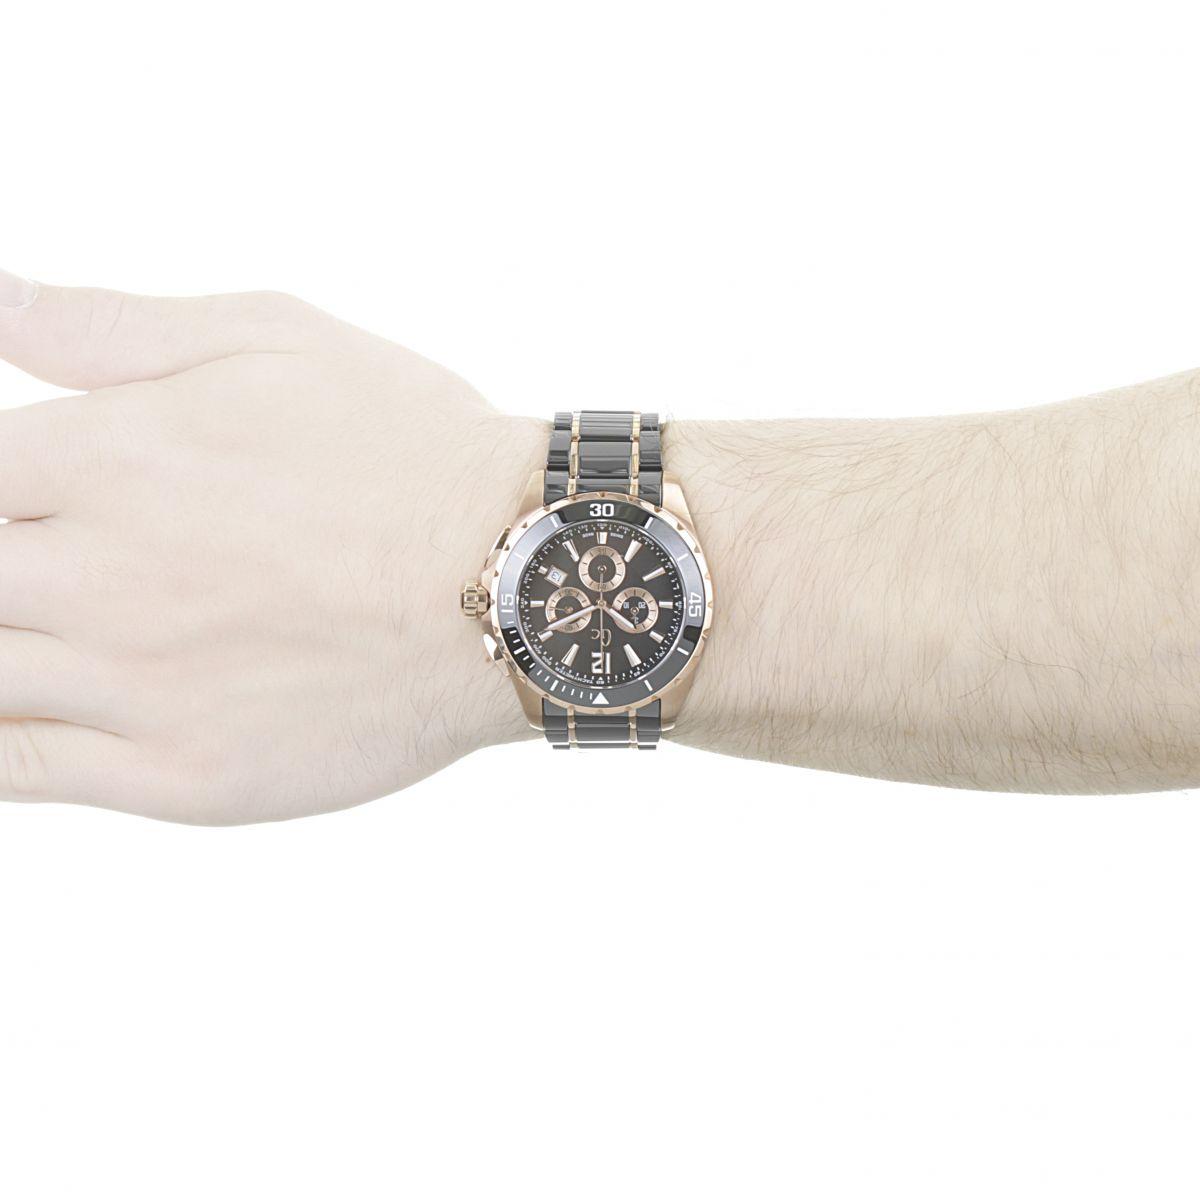 Gents Gc Sport Class XXL Chronograph Watch (X76004G2S) | WatchShop.com™